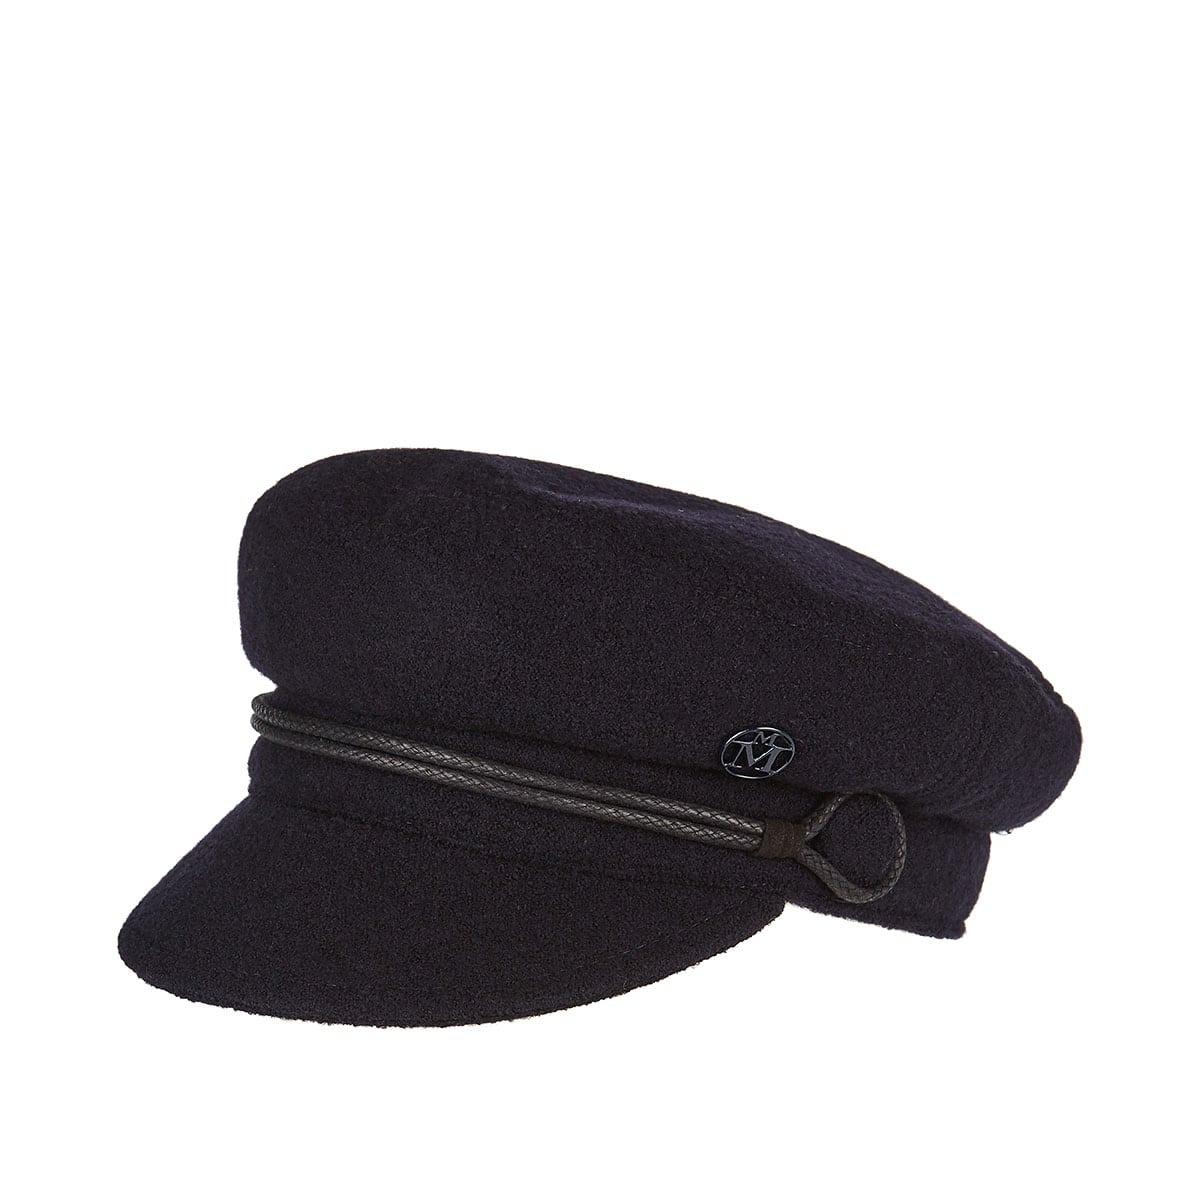 New Abby wool cap